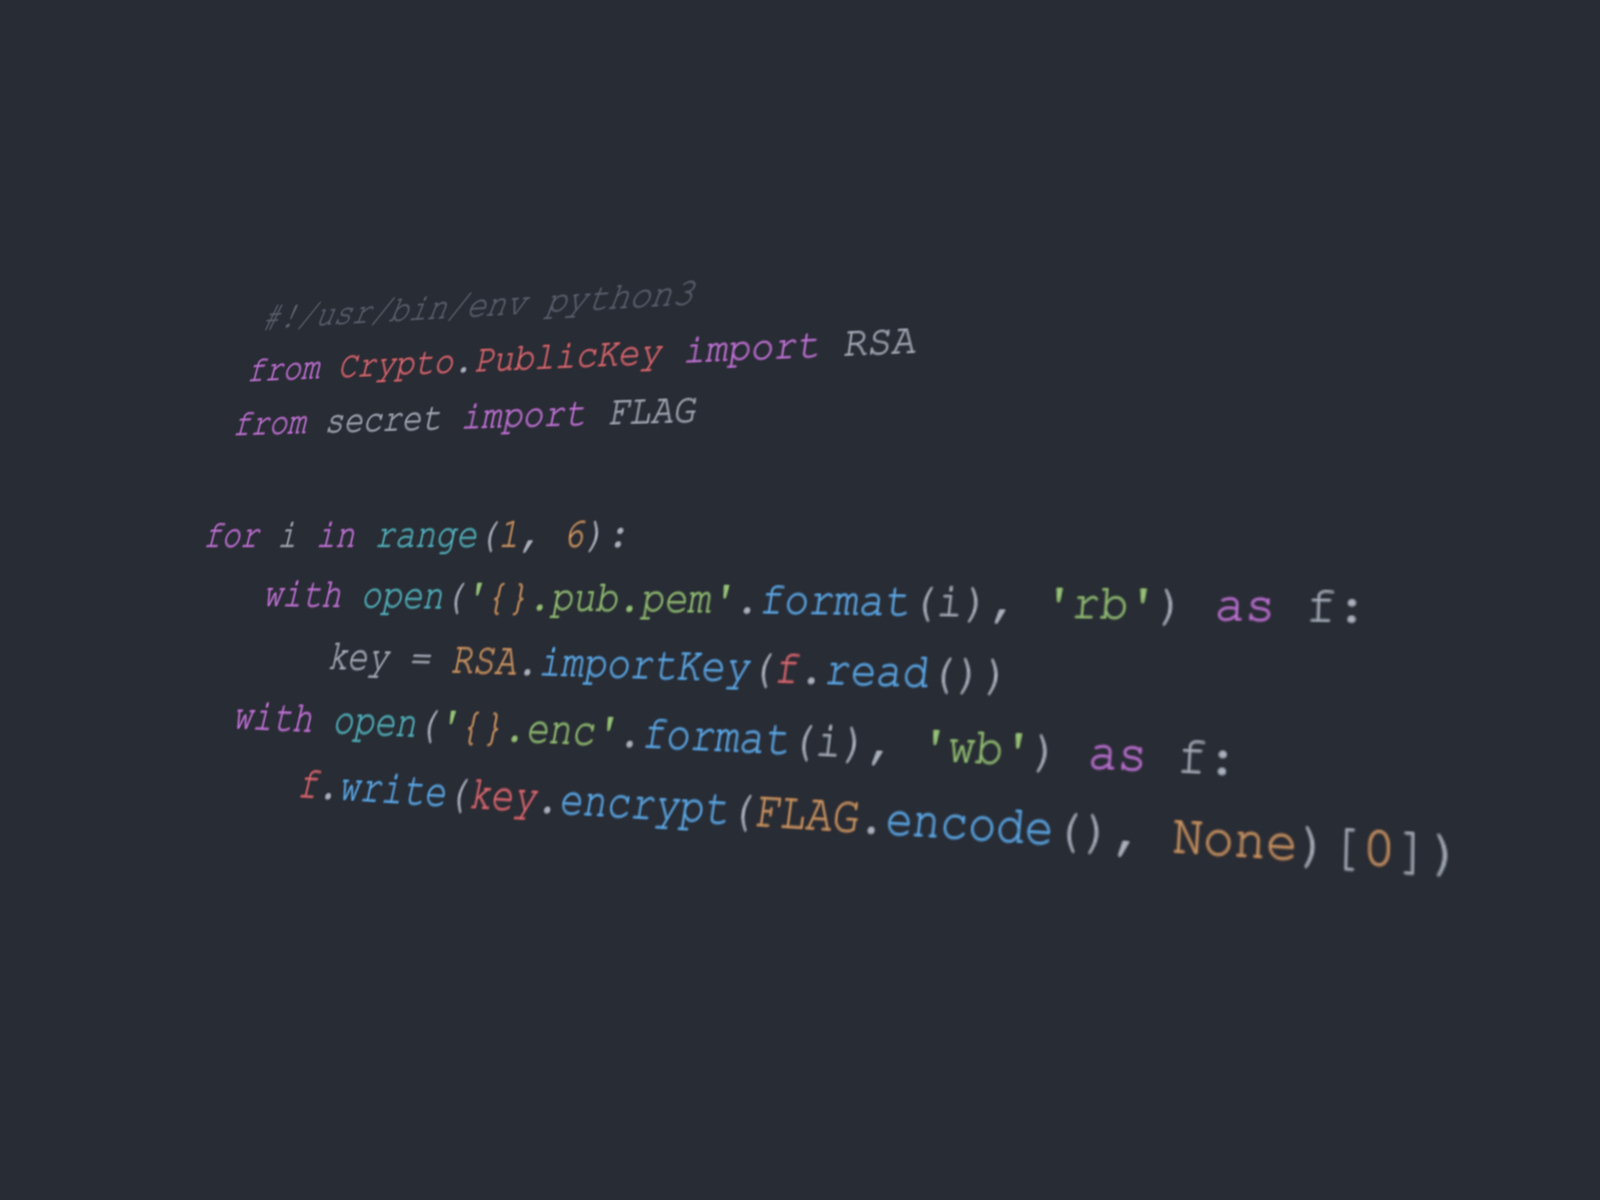 1600x1200 Python Programming Syntax 4k 1600x1200 Resolution